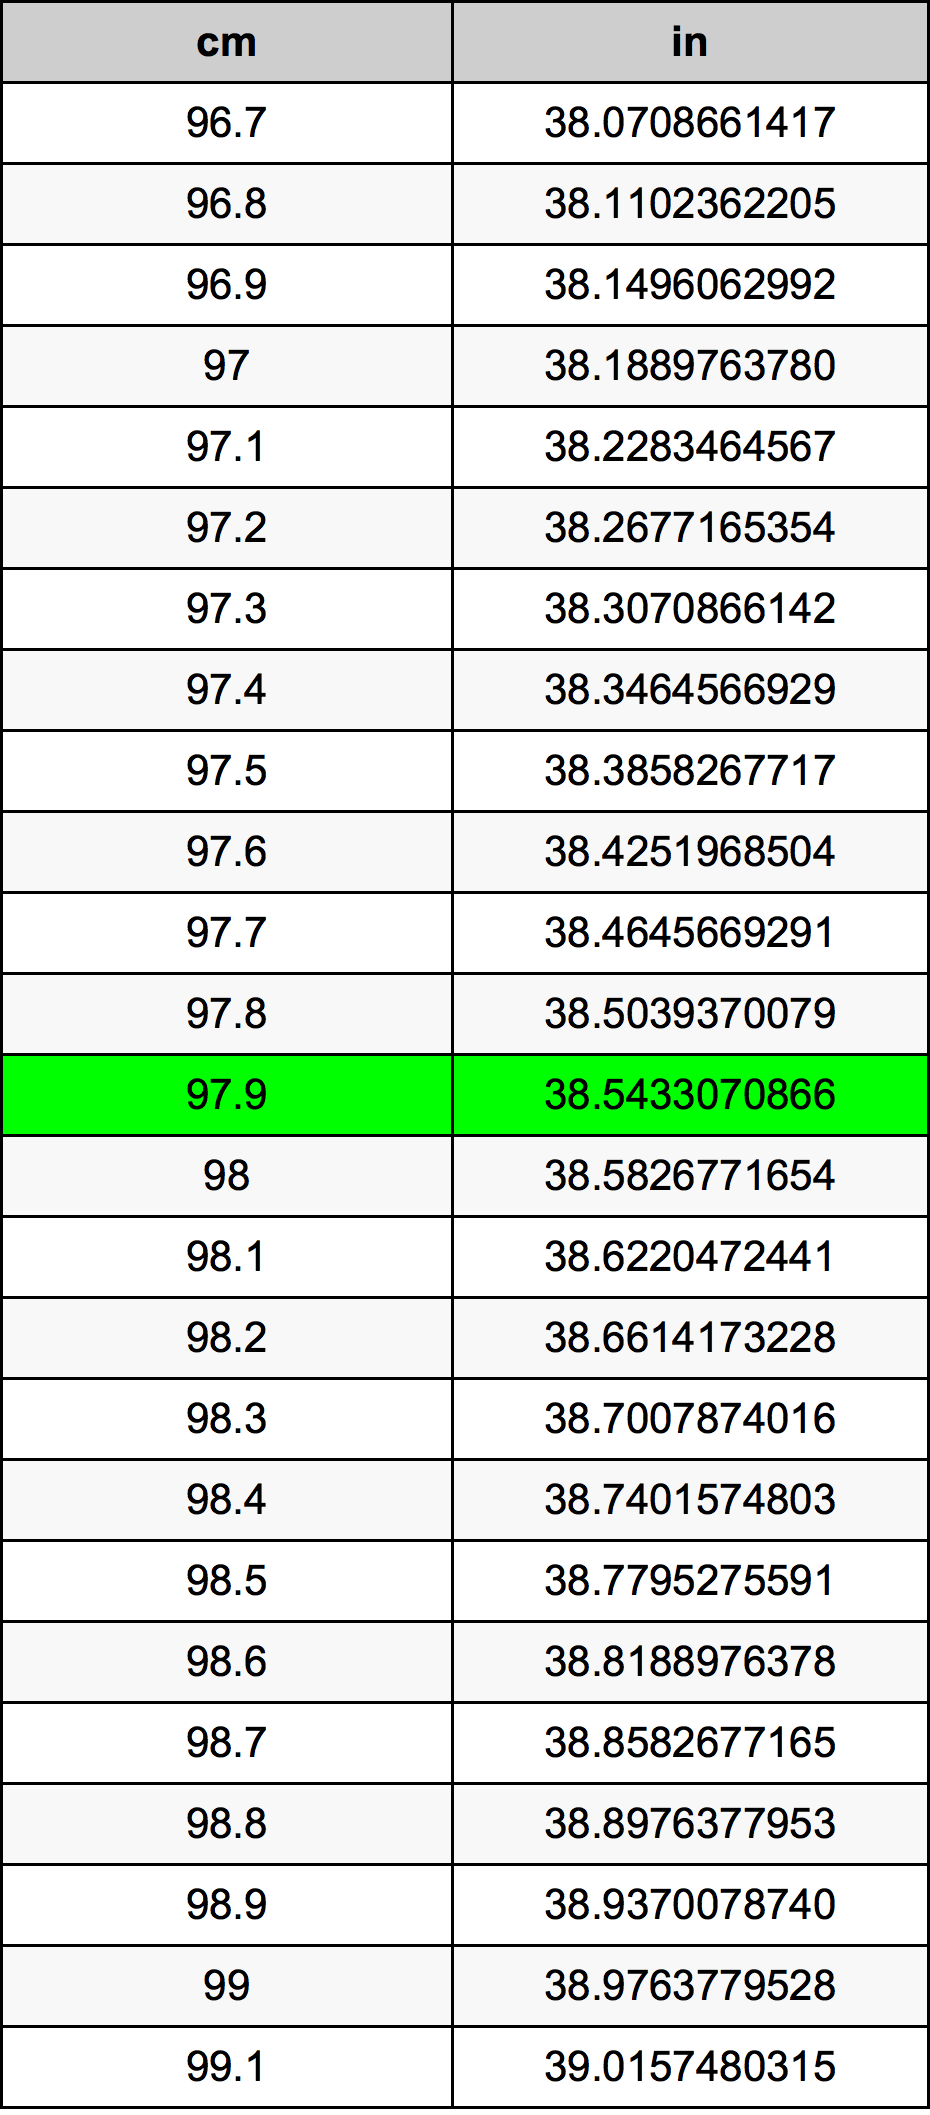 97.9 Centimeter konverteringstabellen